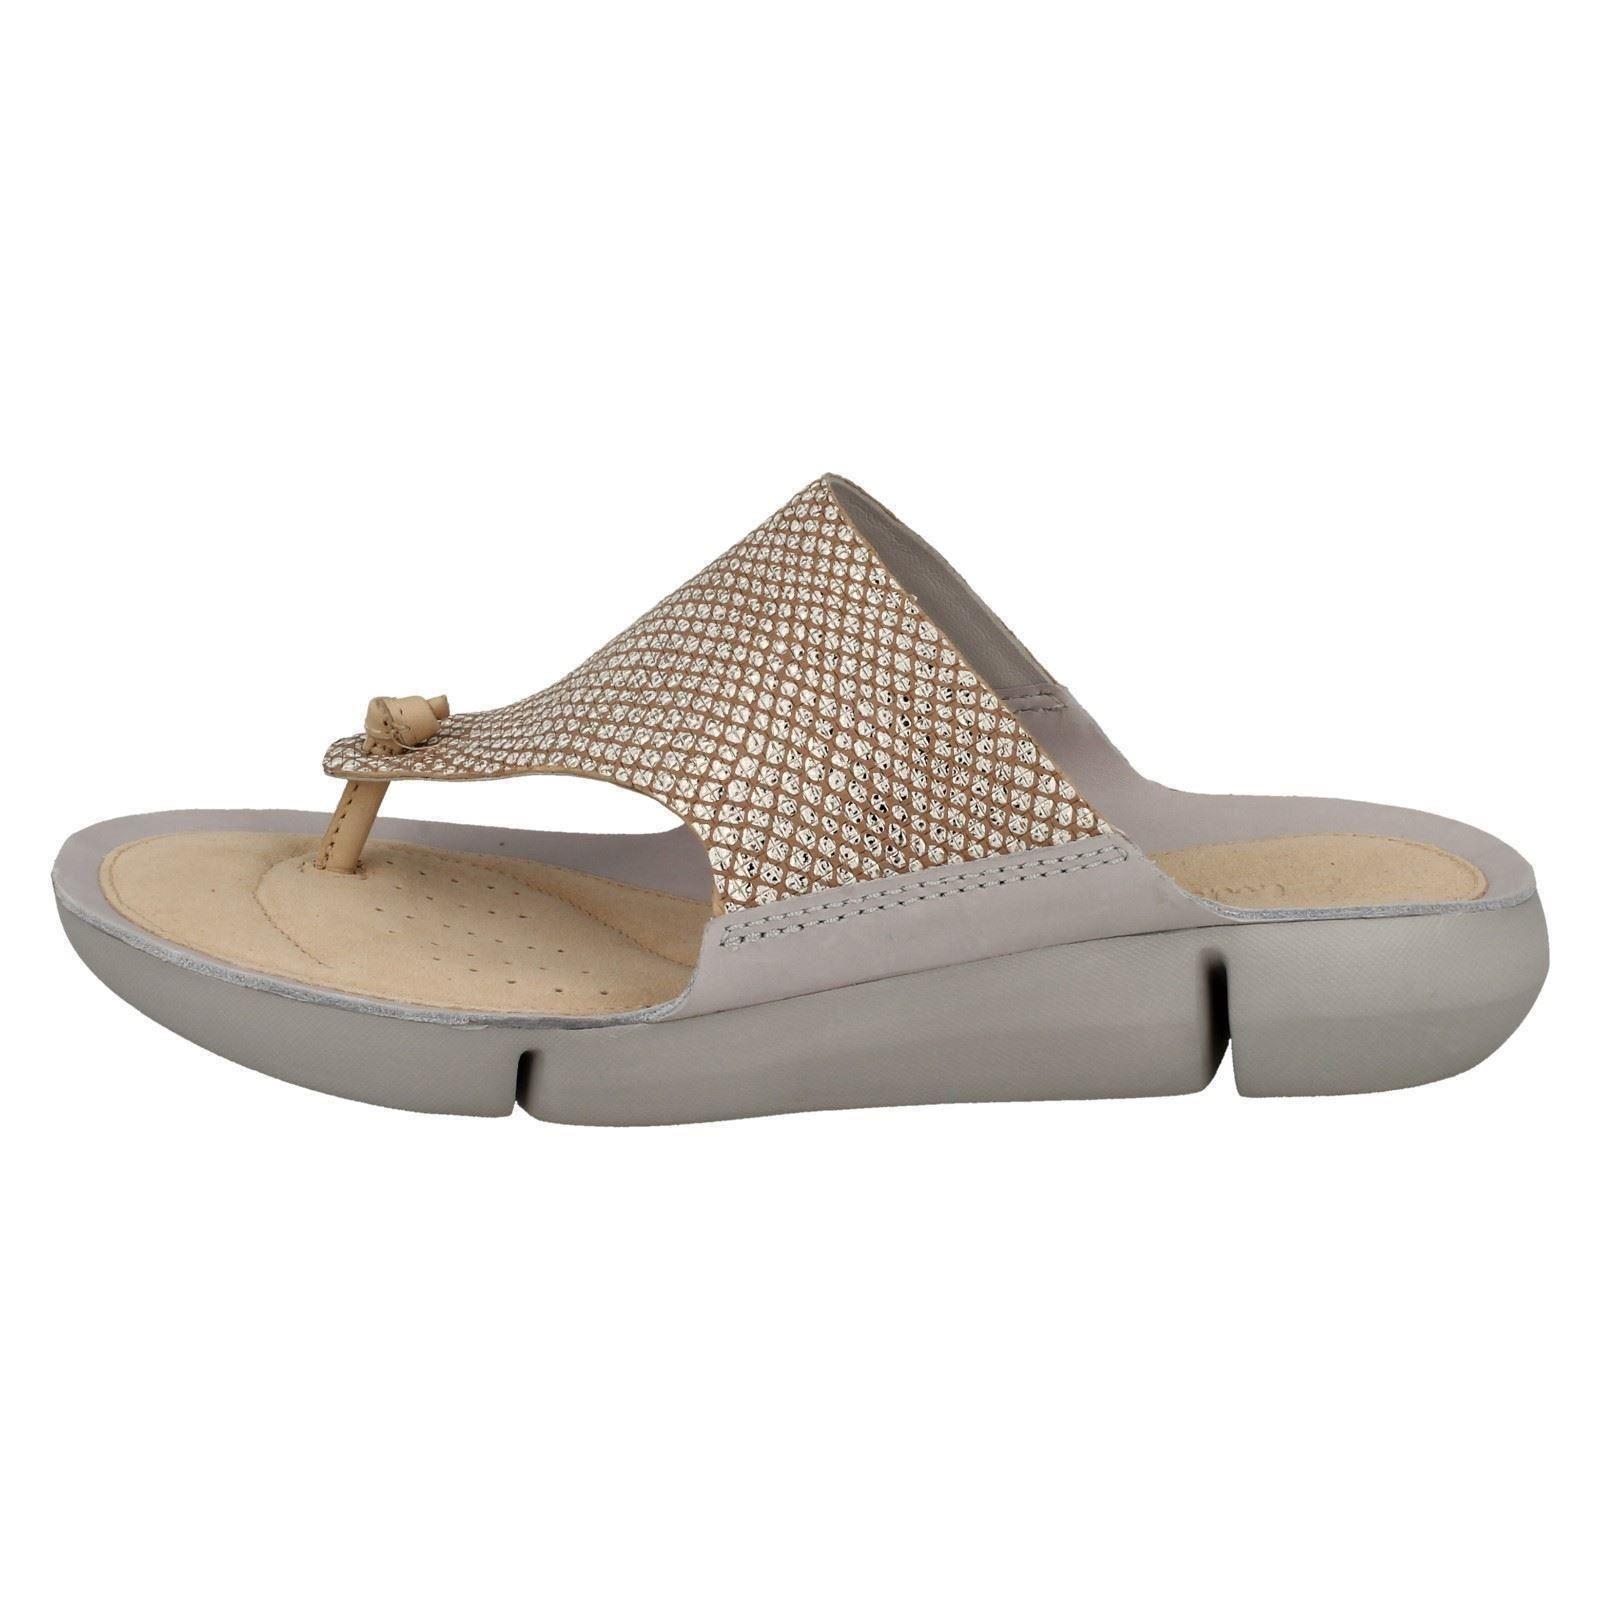 1a67659fdad6 Ladies Clarks Tri Carmen Flip Flops